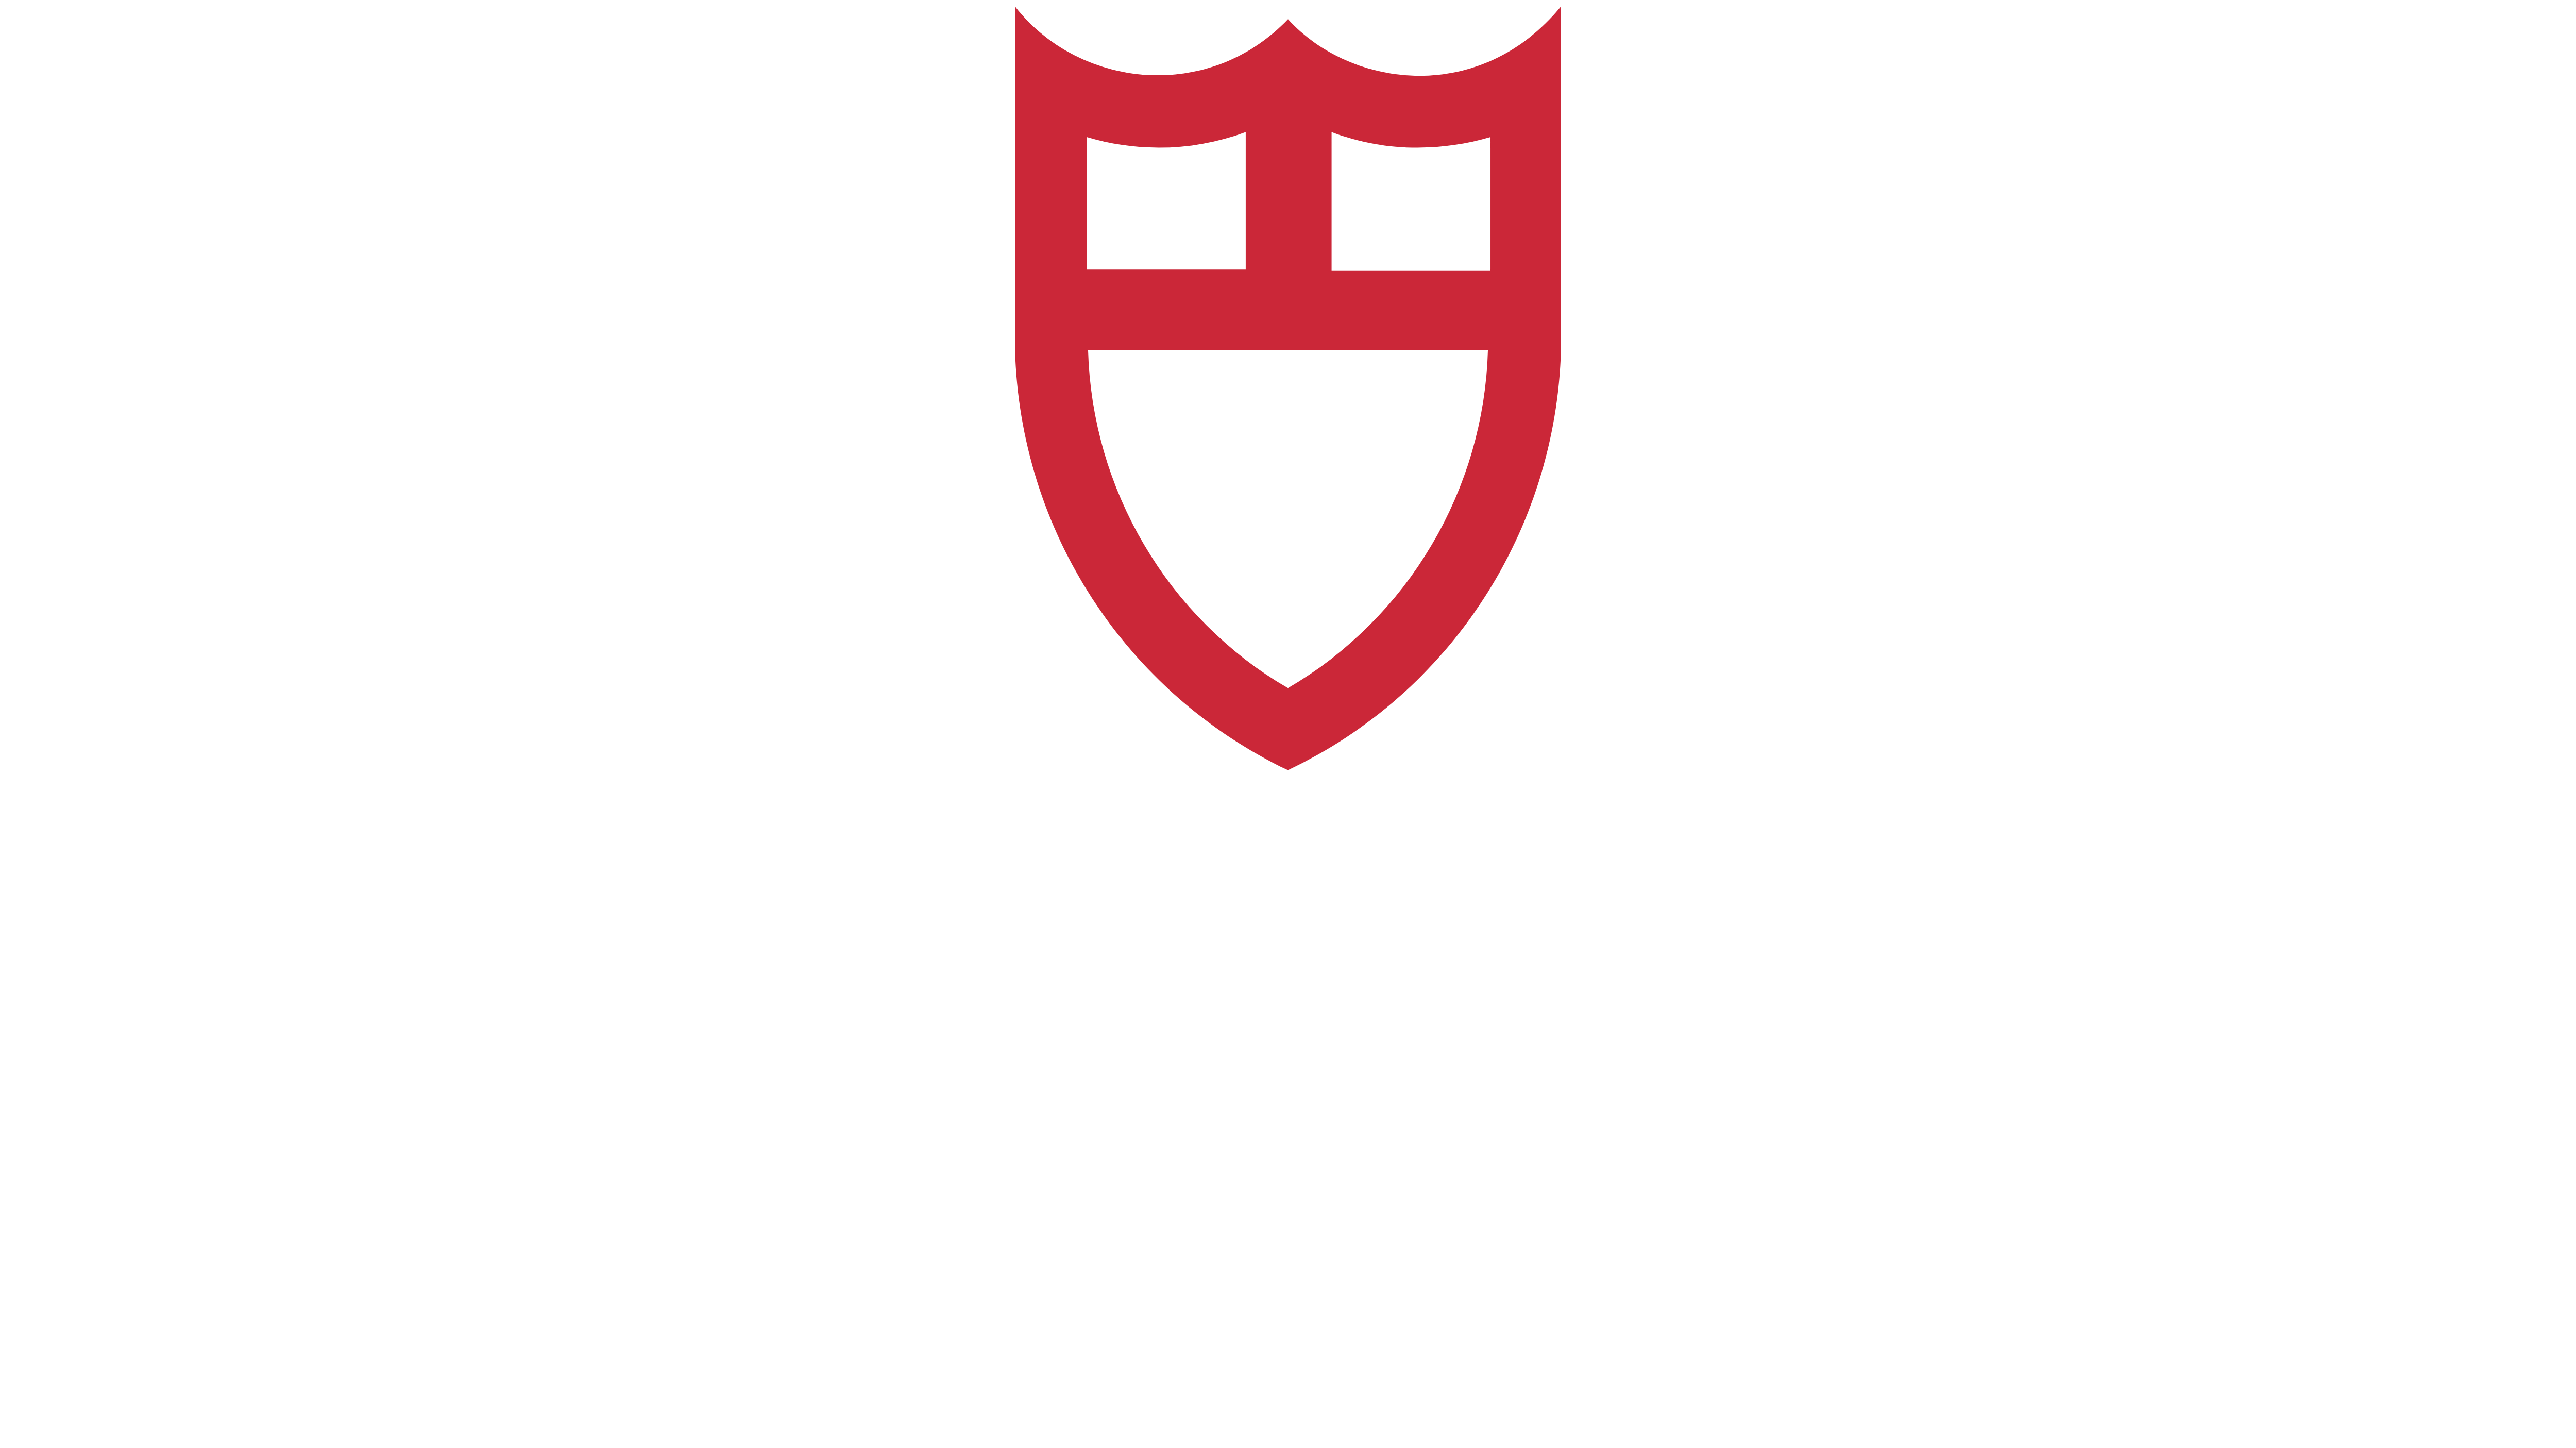 Tudor – Logos Download